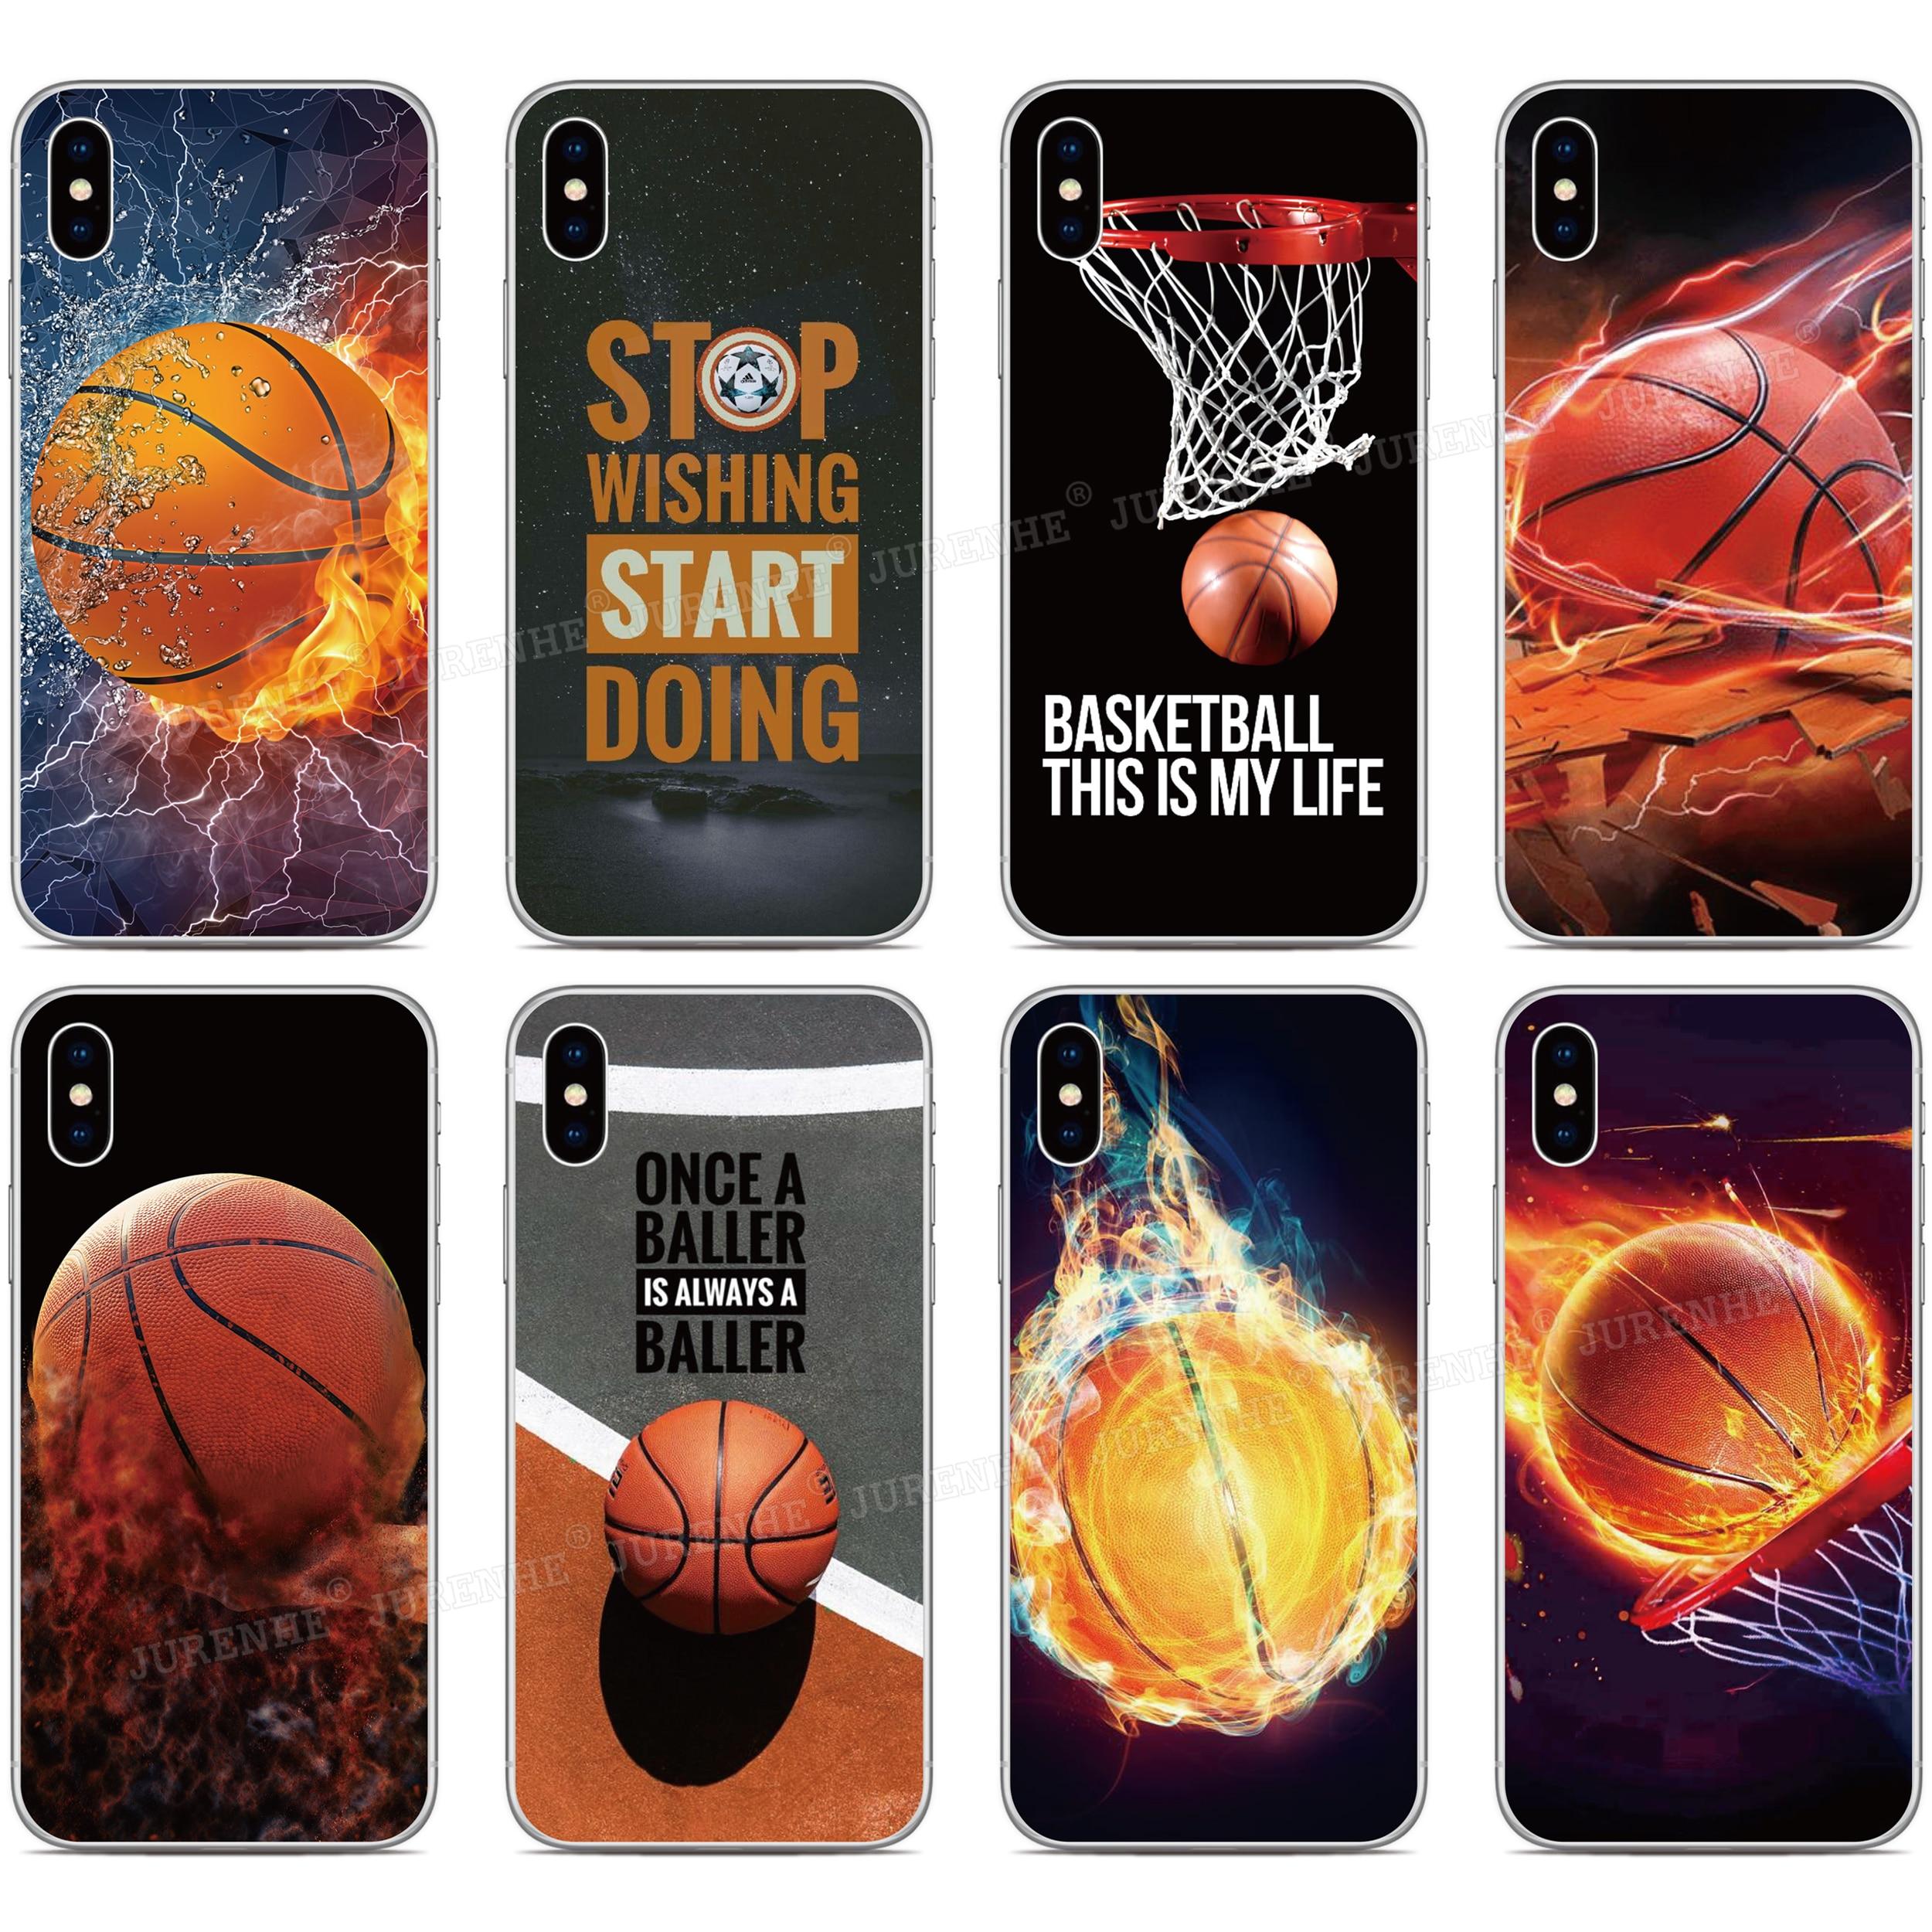 Baloncesto cubierta para Samsung Galaxy Nota 20 Pro S20 Ultra S11E S11 más A01 A11 A21S A31 M31 M11 A90 A41 A51 A71 A70 A50 caso